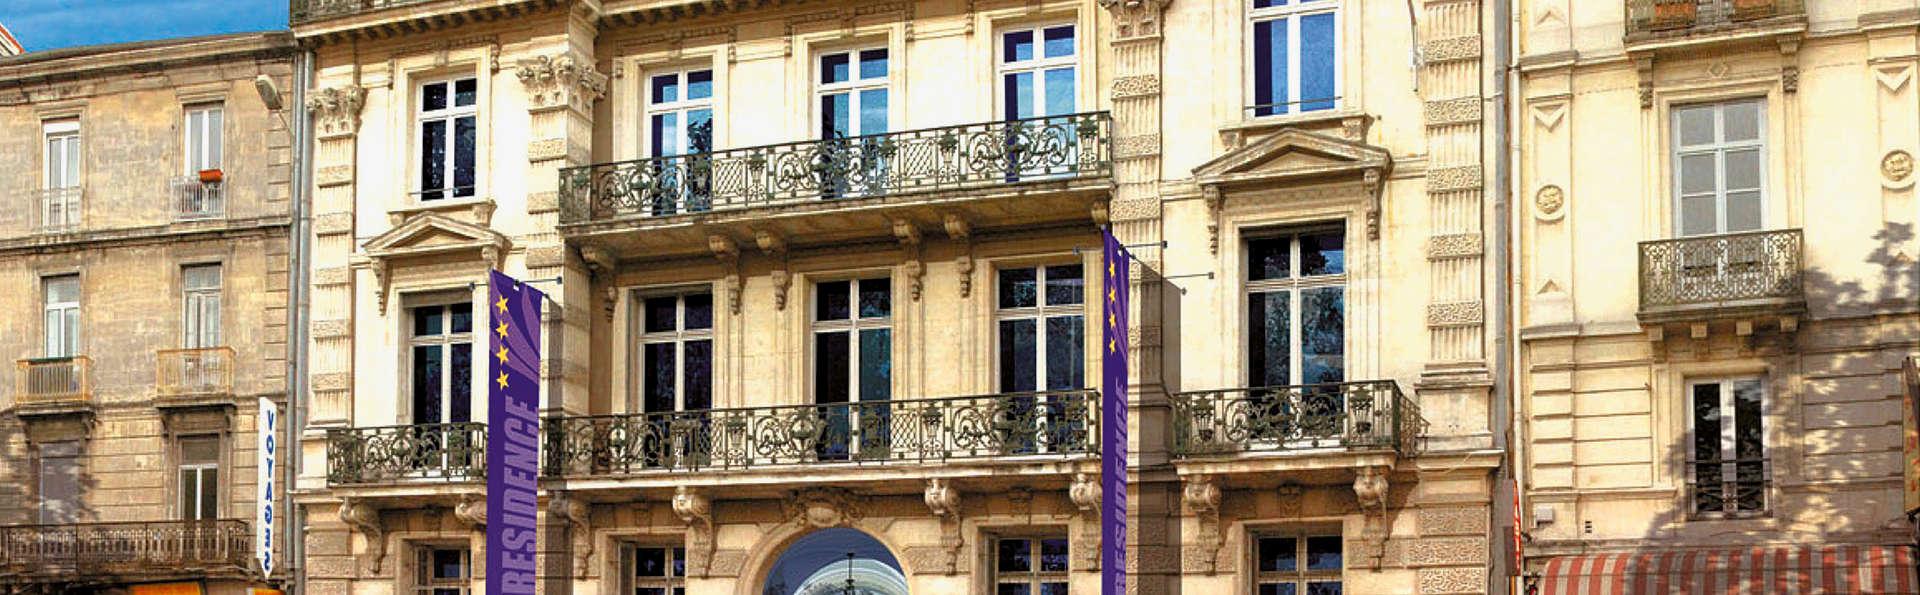 Appart'hôtel Odalys Les Occitanes - EDIT_Fachada2.jpg